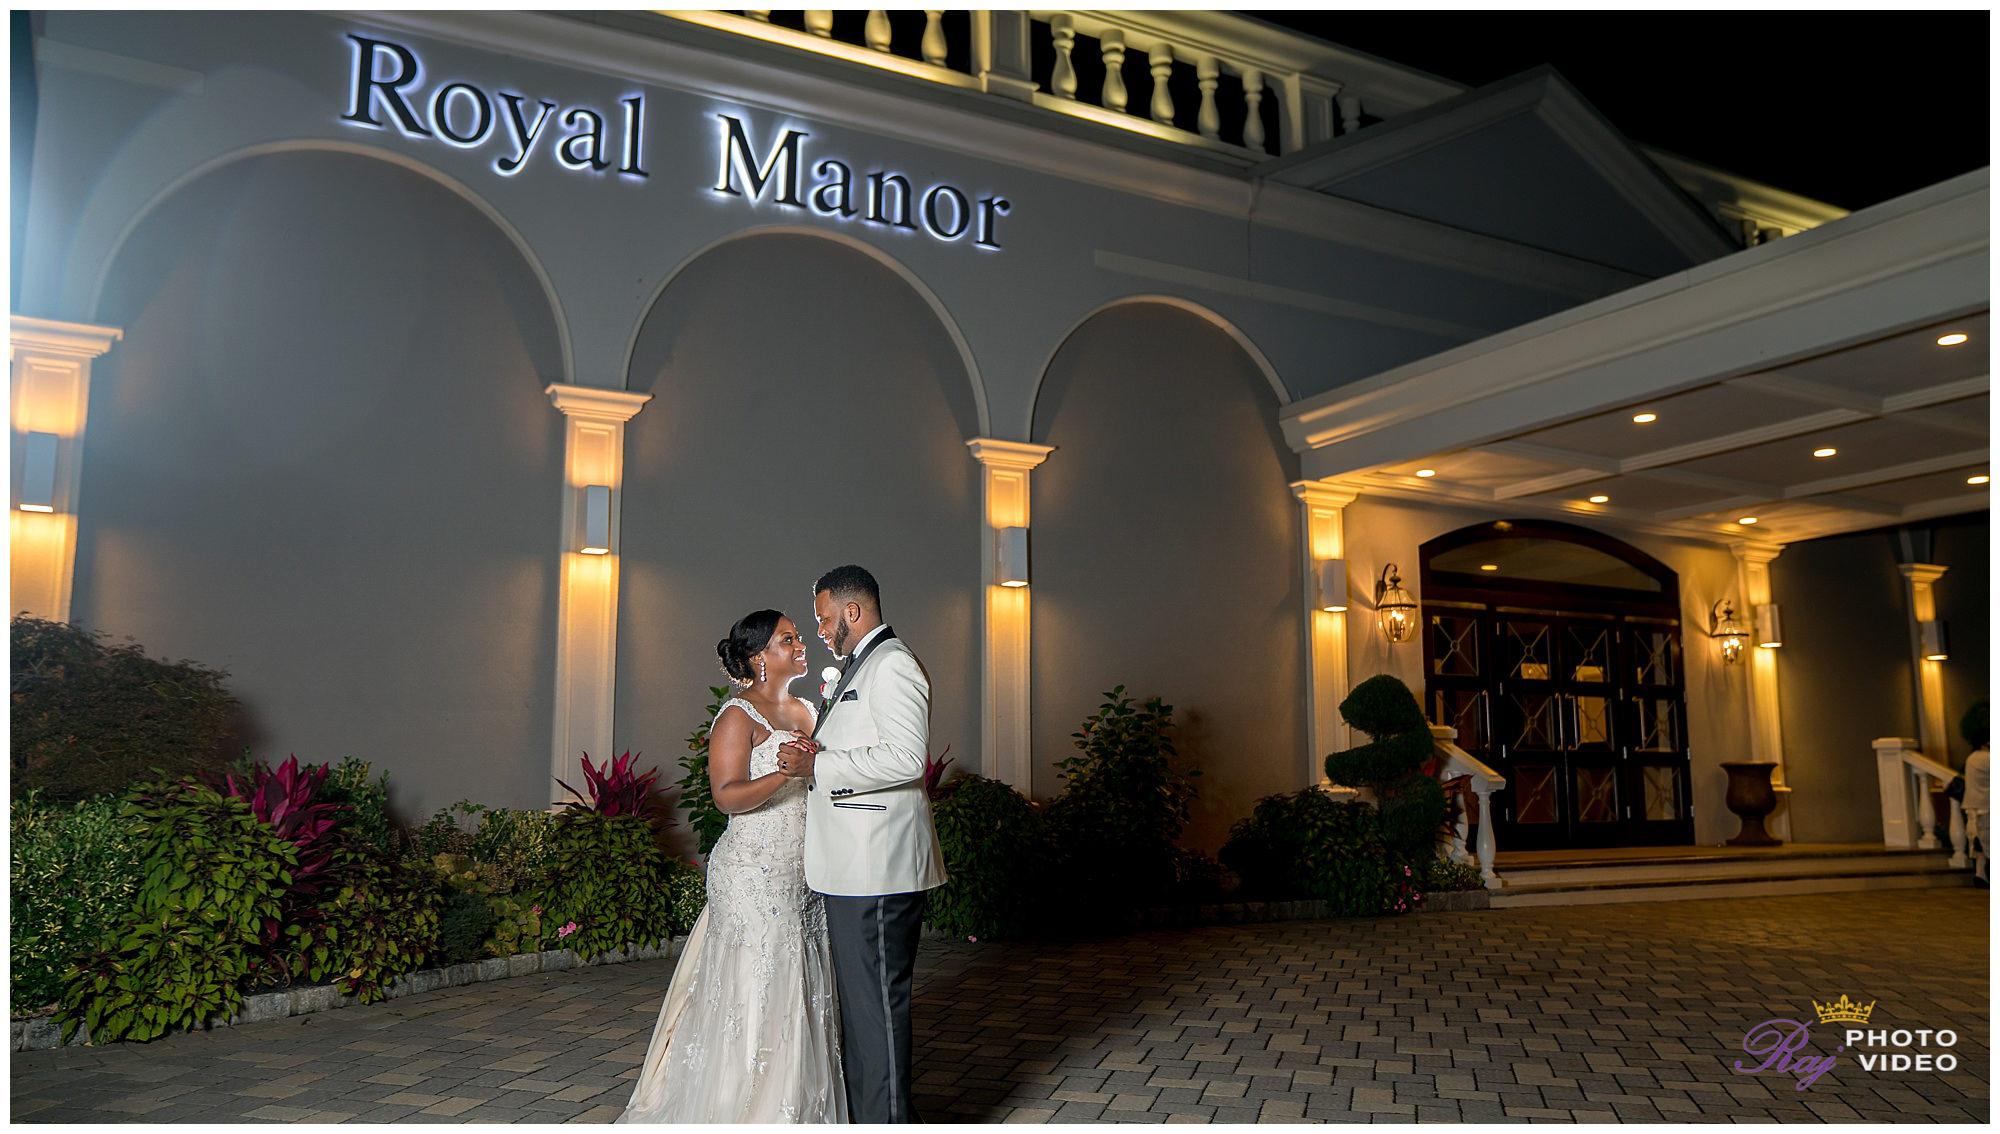 Royal_Manor_Garfield_NJ_Christian_Wedding_Jade_Scott-0031.jpg